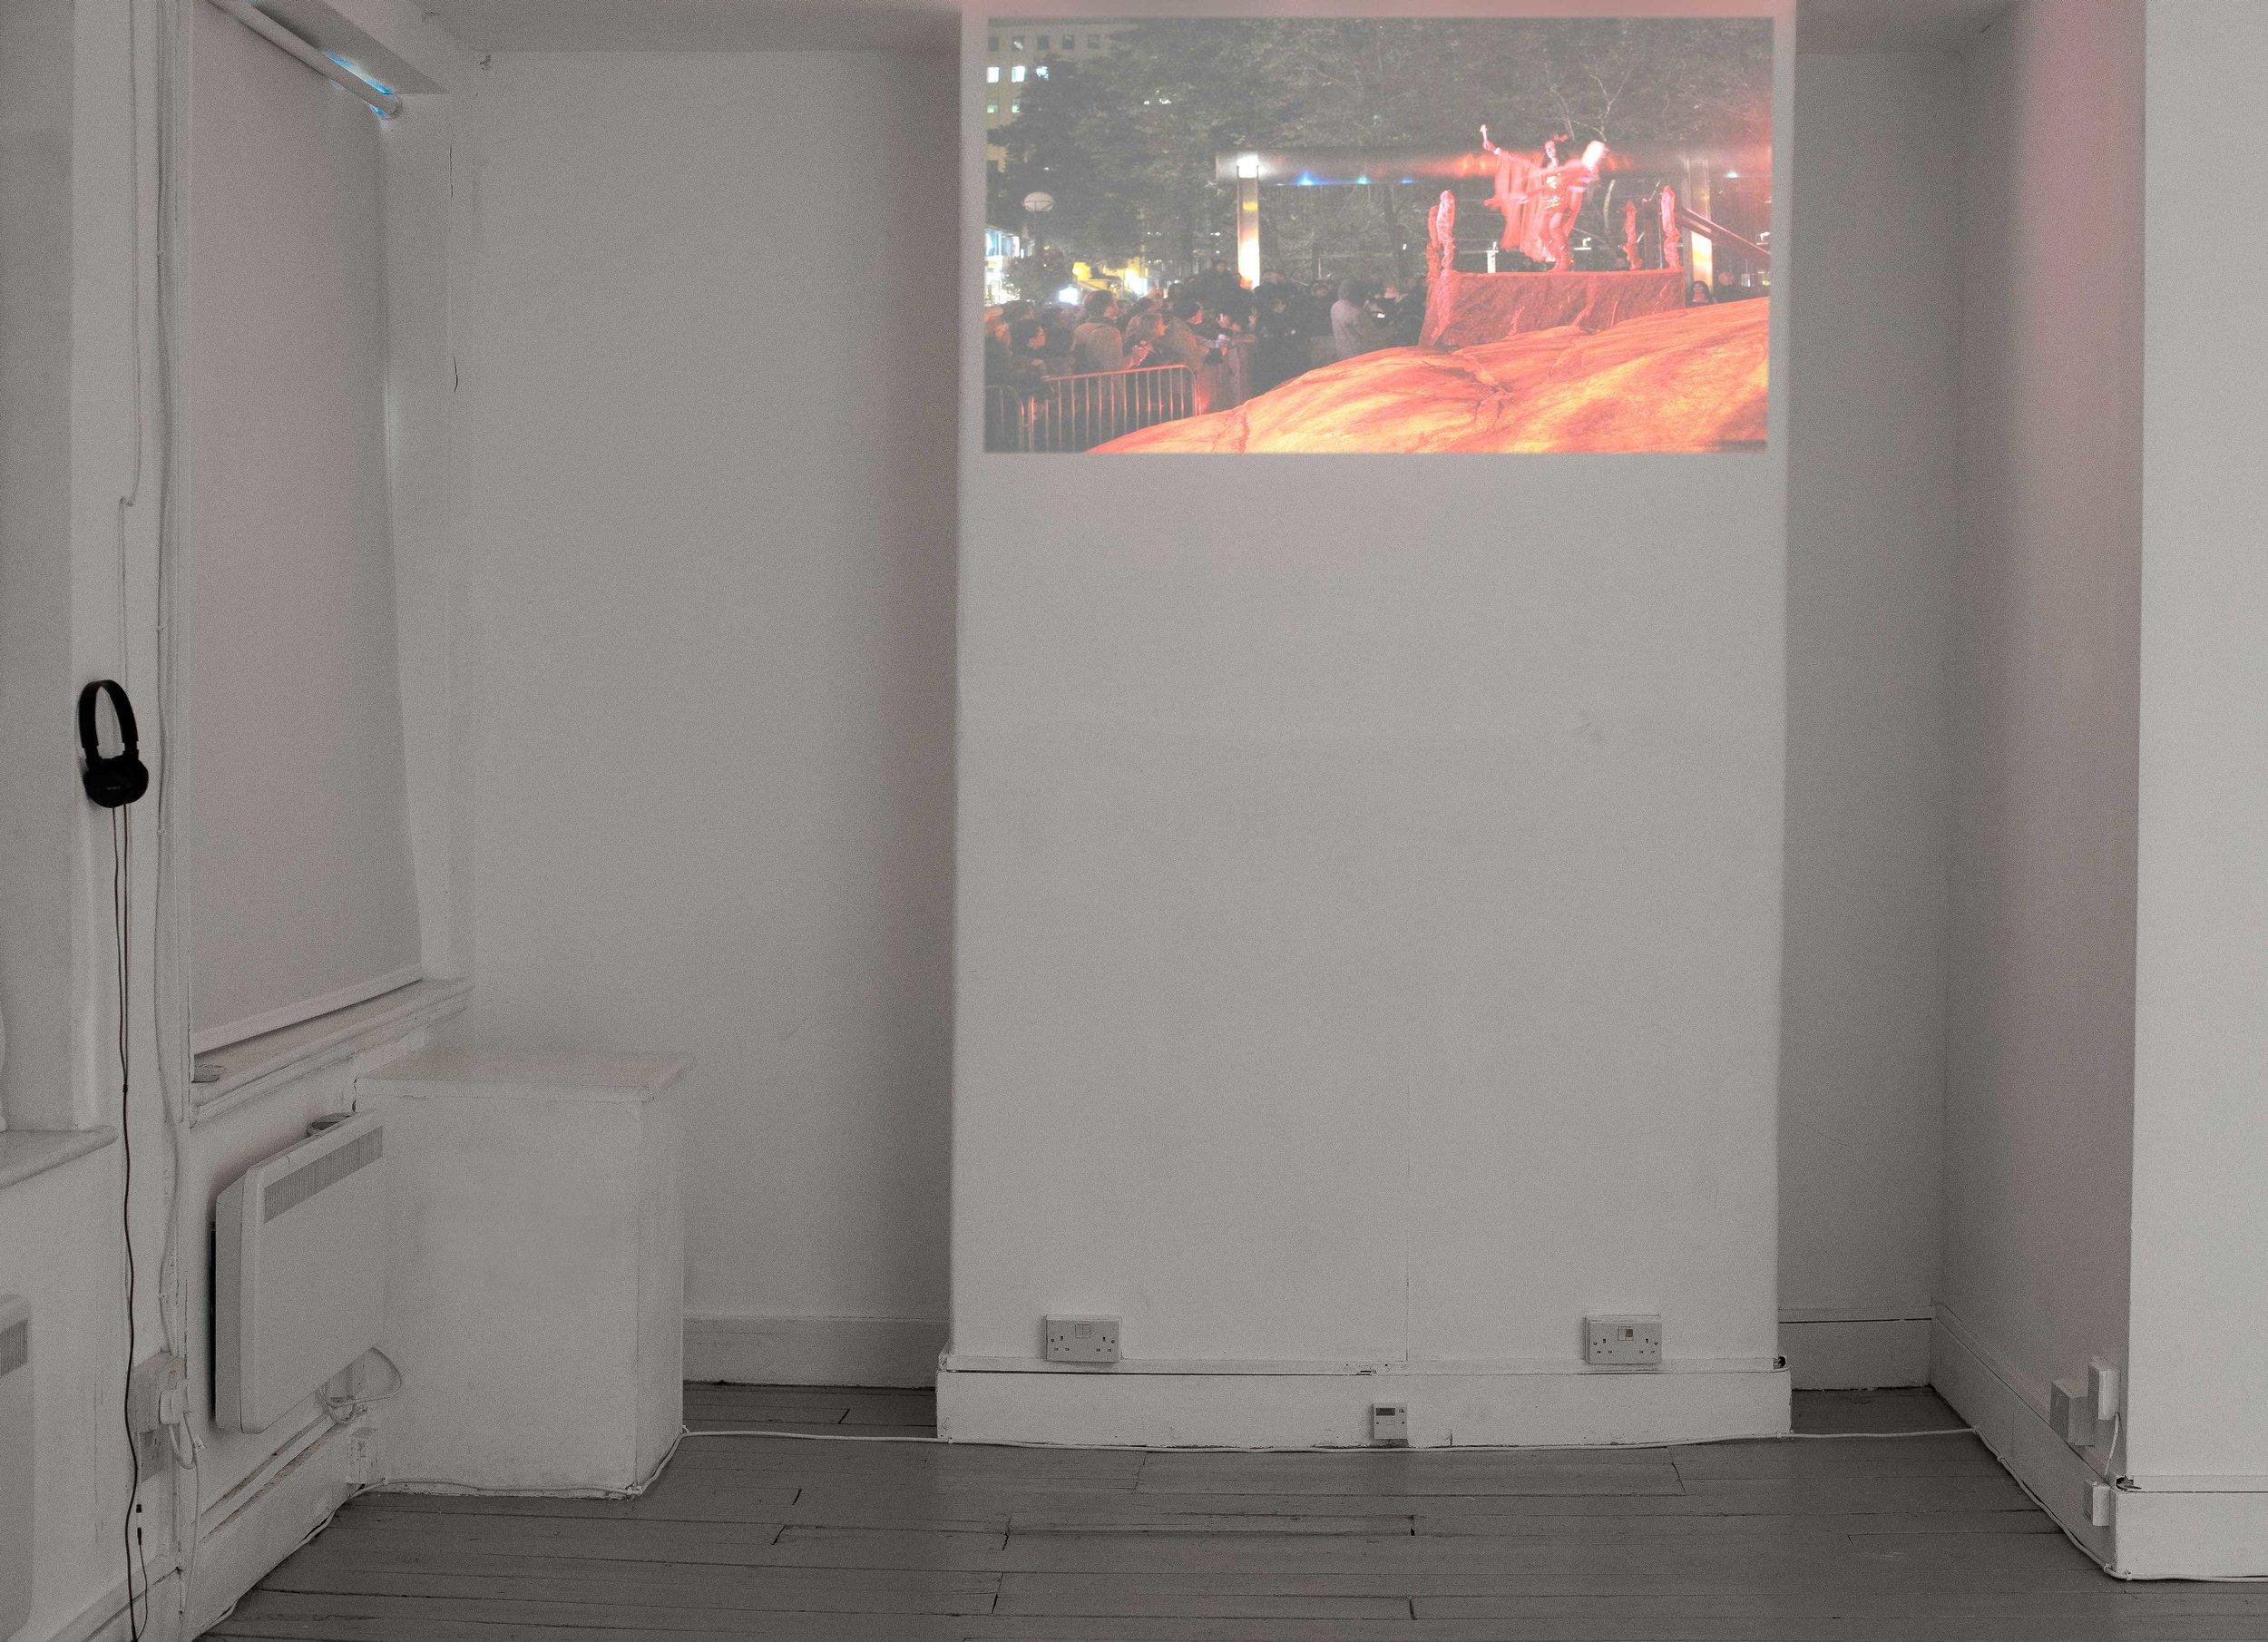 Kent Monkman, Iskootāo 2010, video, Kent Monkman in collaboration with Gisèle Gordon. Courtesy the artists and Vtape. Photo Katarzyna Perlak